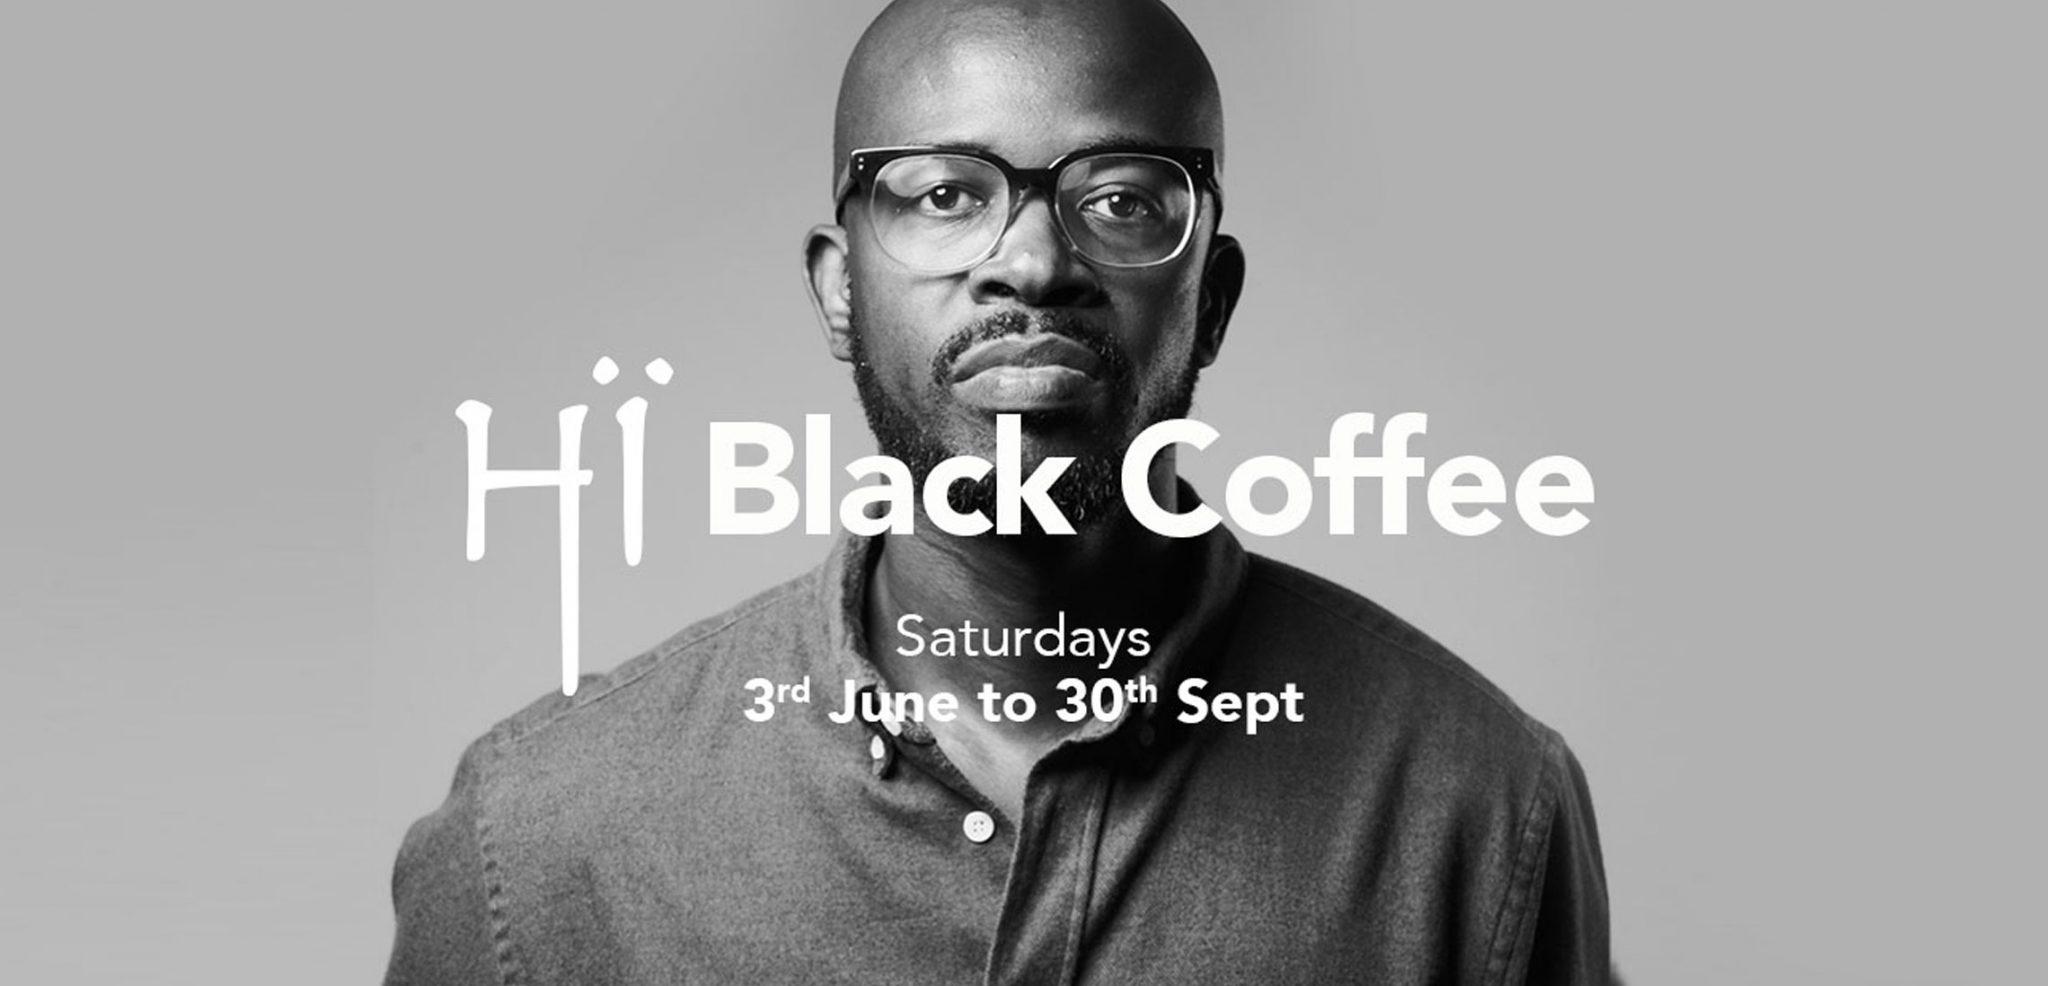 BLACK COFFEE ANNOUNCED AS HÏ IBIZA FIRST DJ RESIDENCY